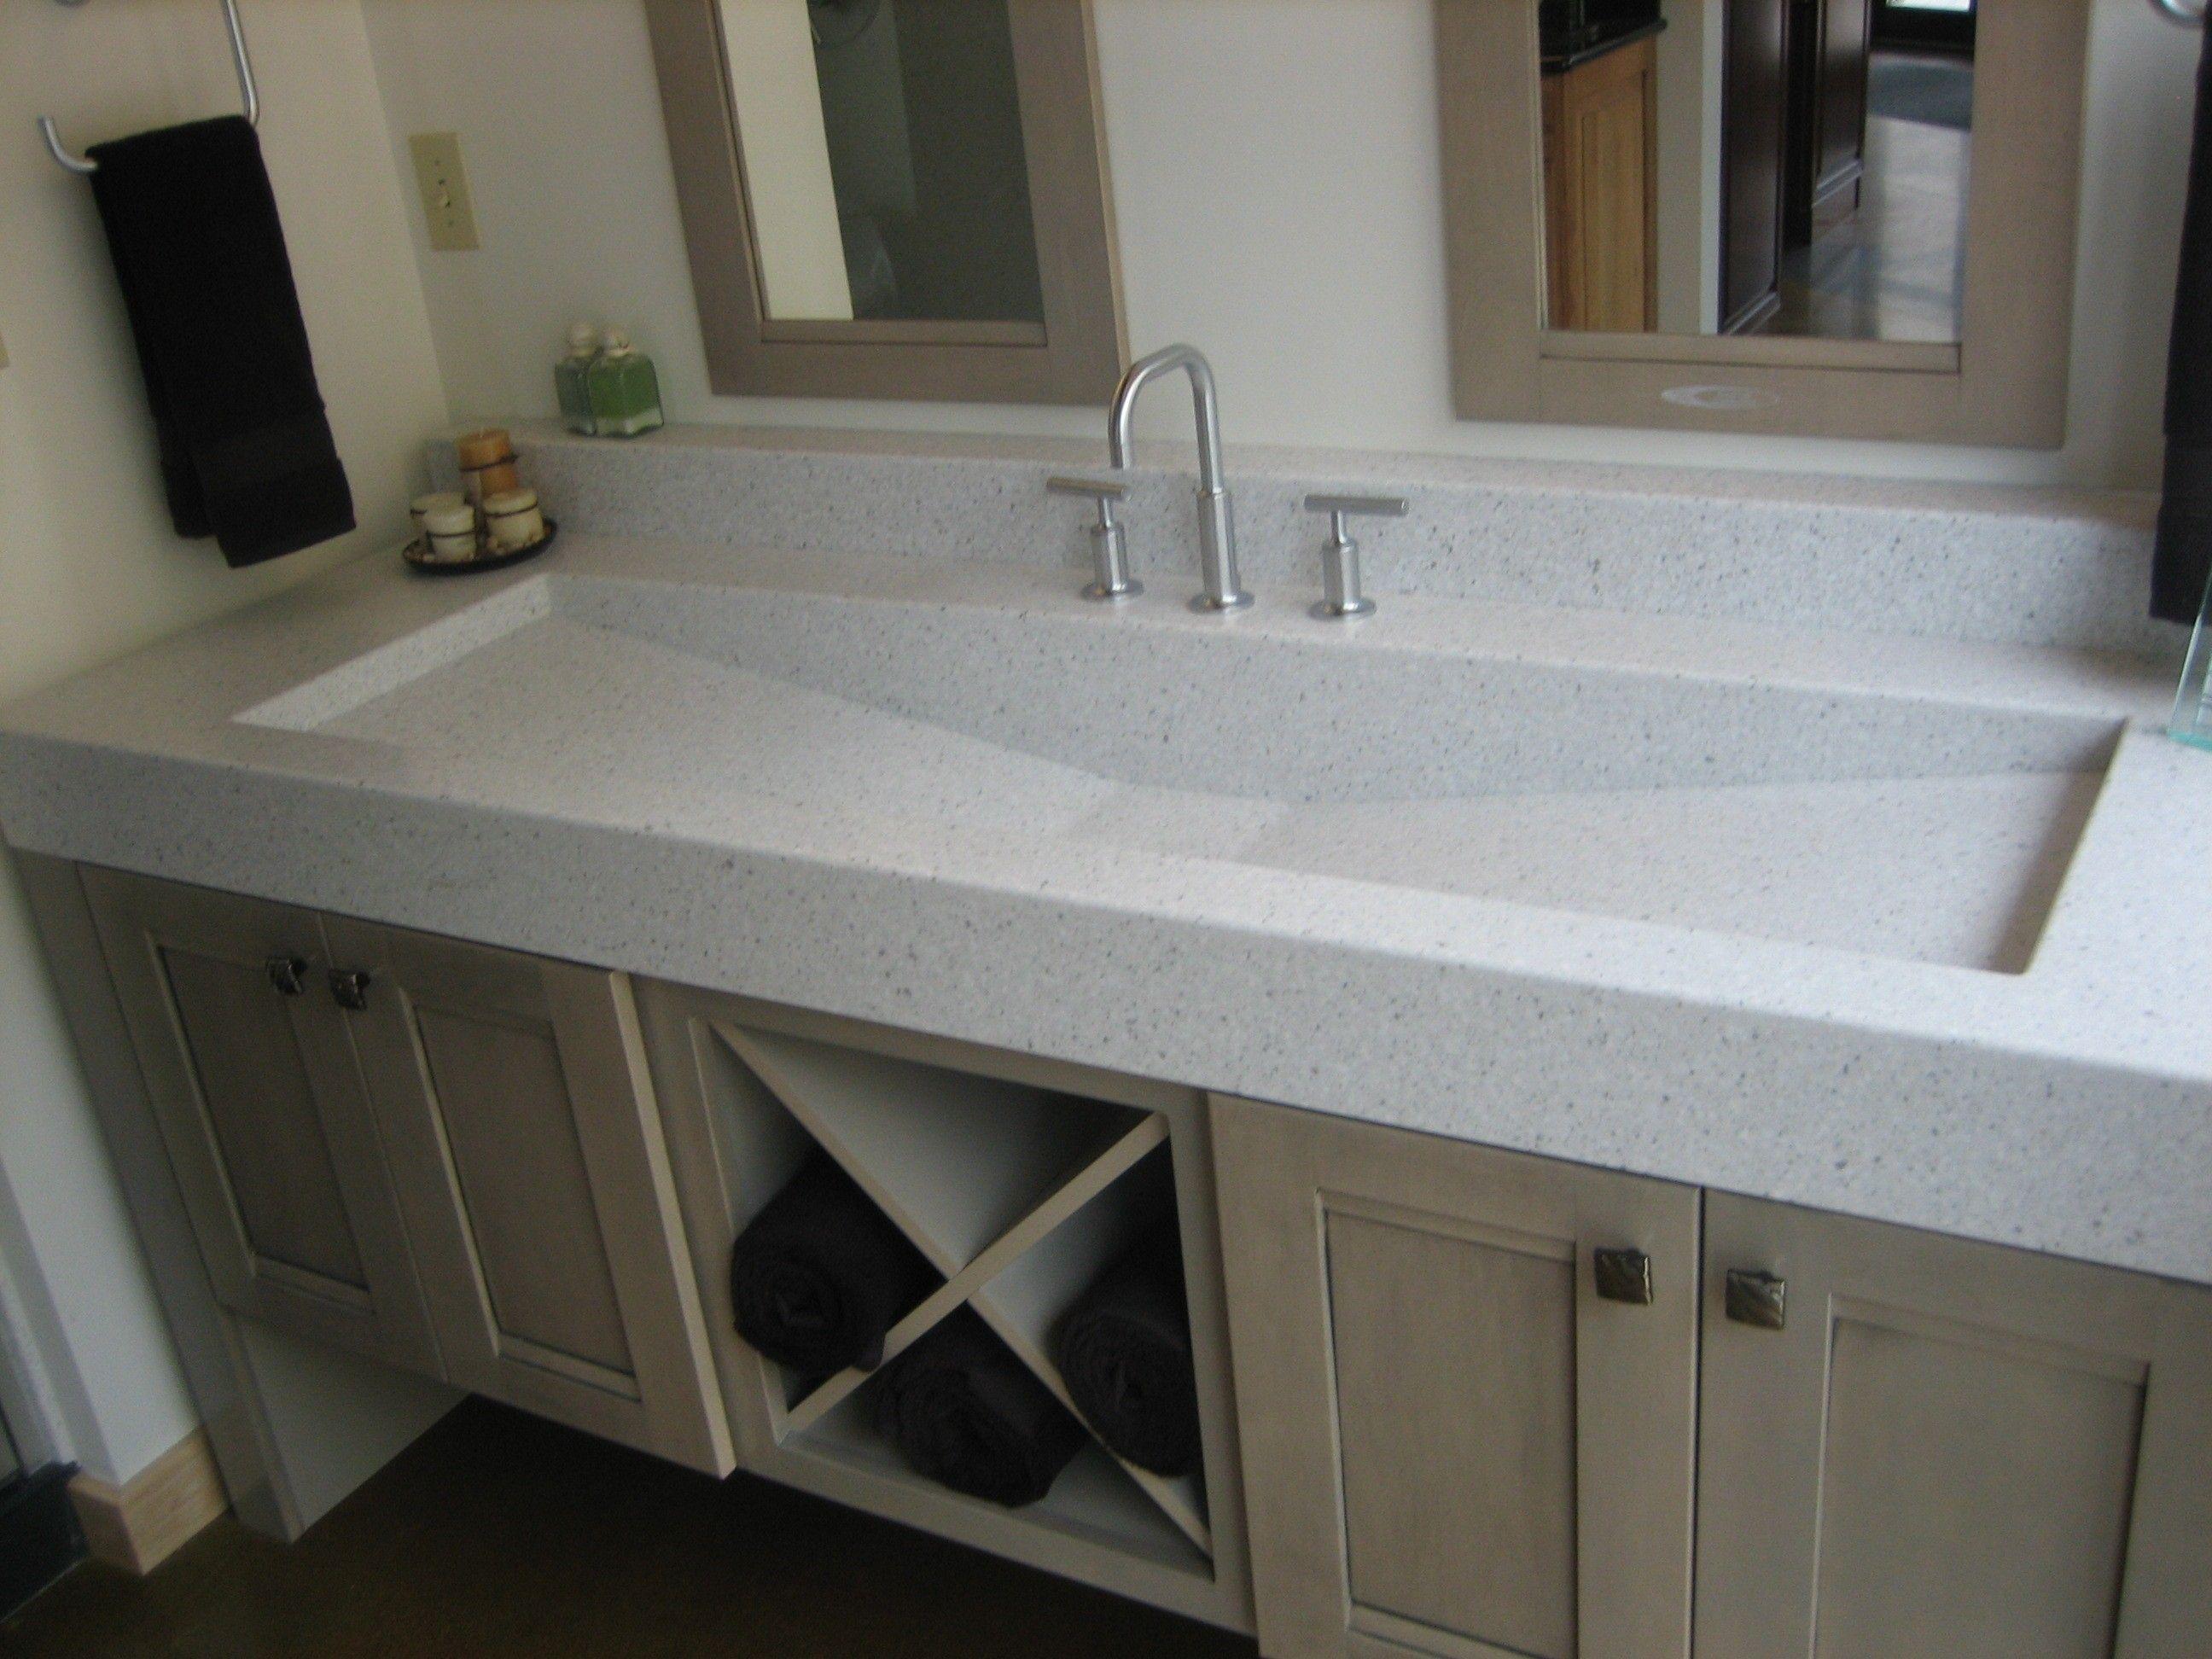 Brilliant Single Trough Sink Double Mirror Google Search Bathroom Download Free Architecture Designs Scobabritishbridgeorg